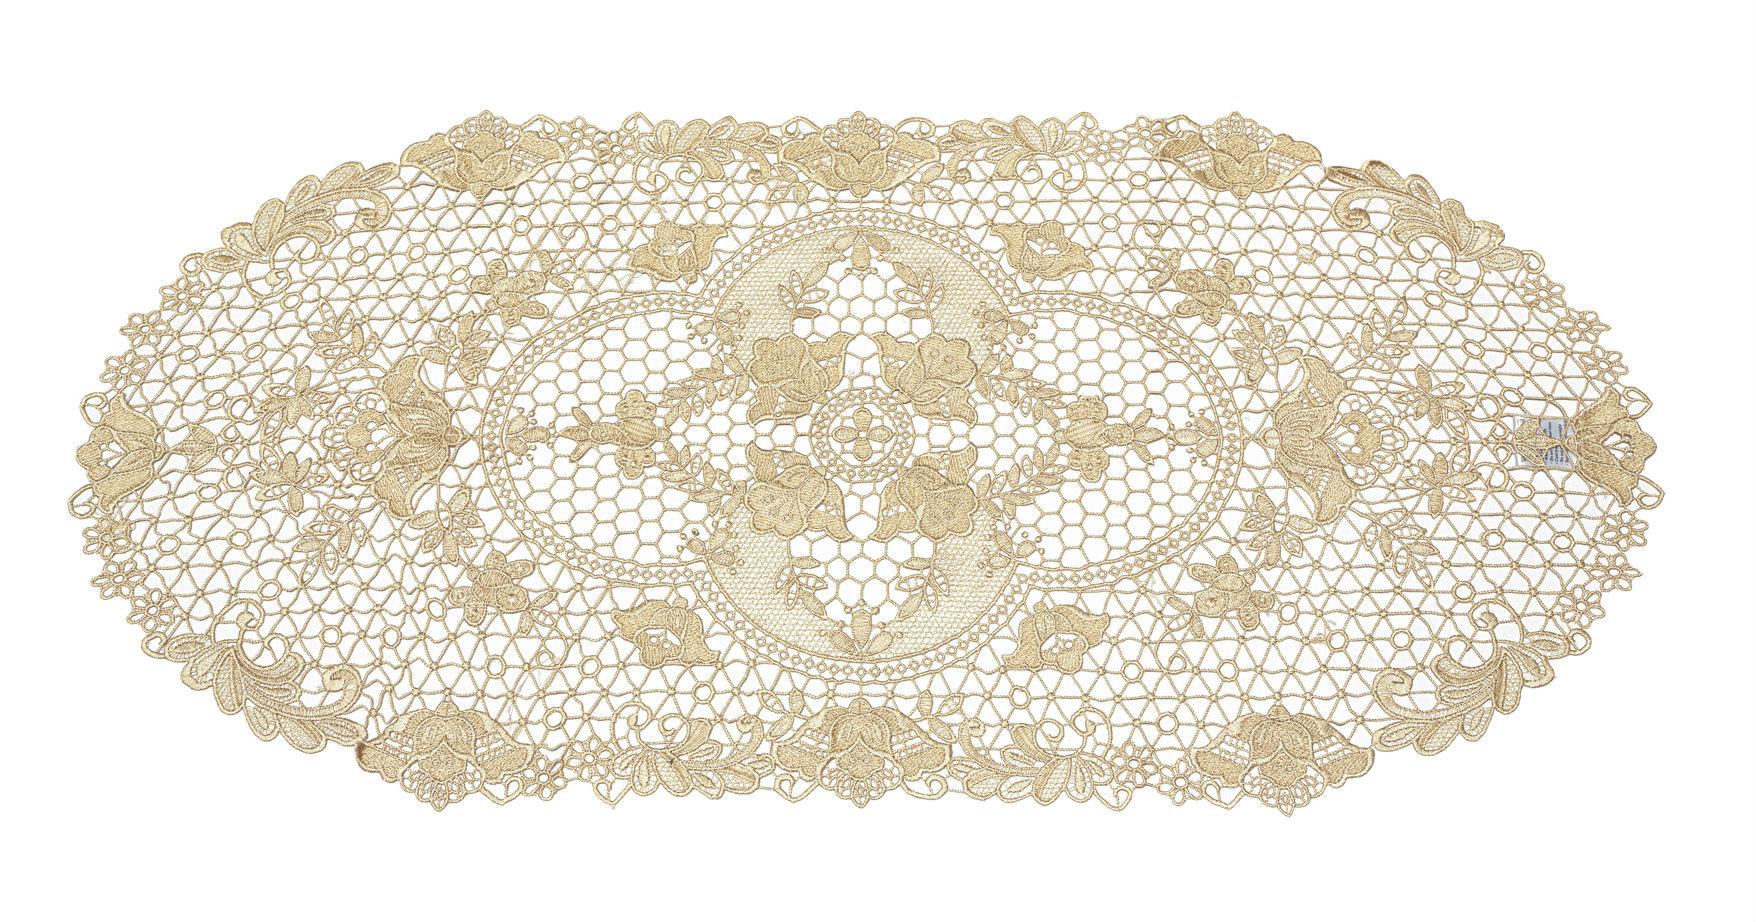 Tatting Lace Floral Soft Polycotton Oval Table Runner/Dresser Scarf. SRB39 Multi-Size (Ecru)